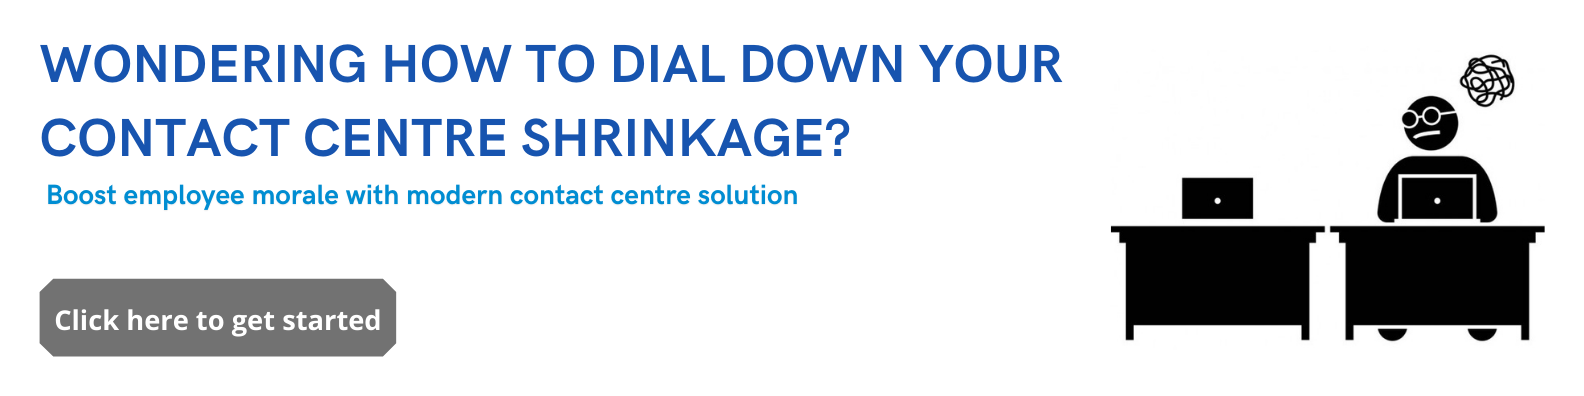 How to address call center shrinkage